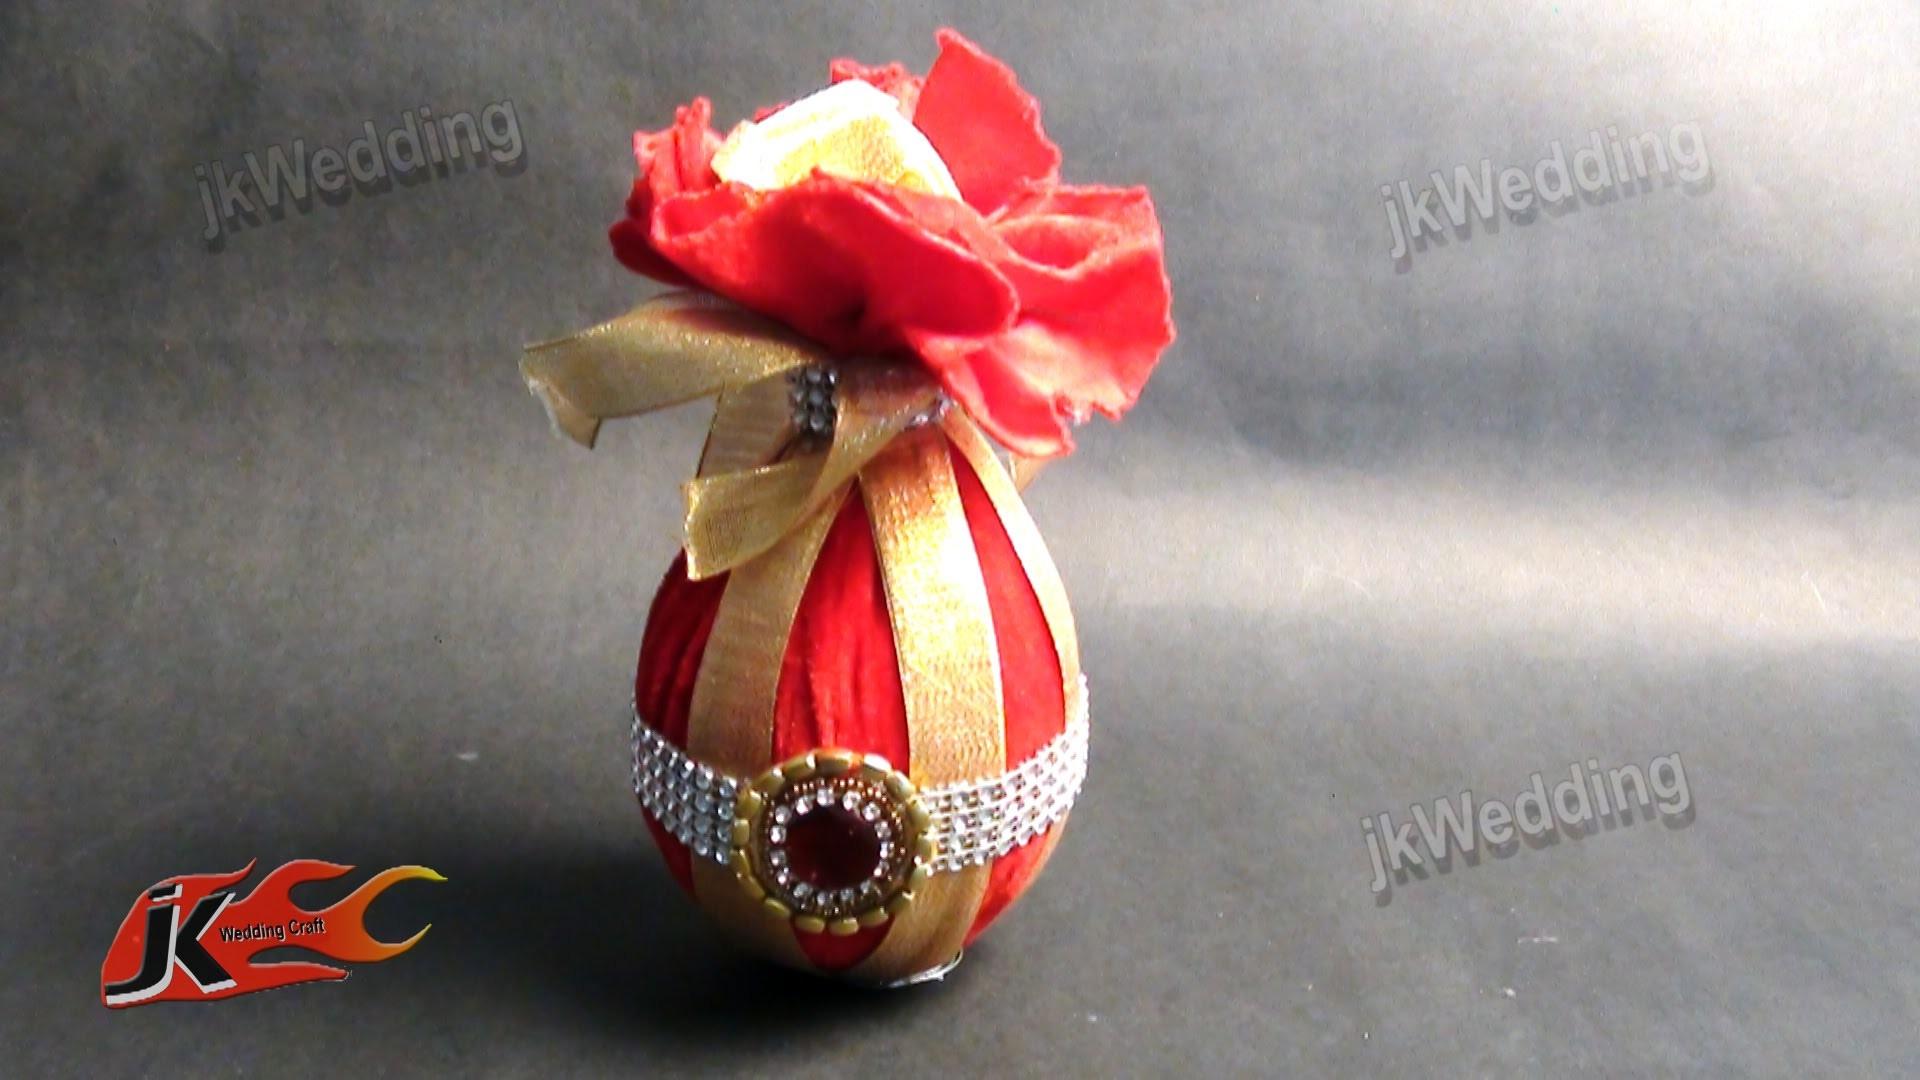 DIY Wedding shagun nariyal packing |How to make Coconut Decoration|JK Wedding 010